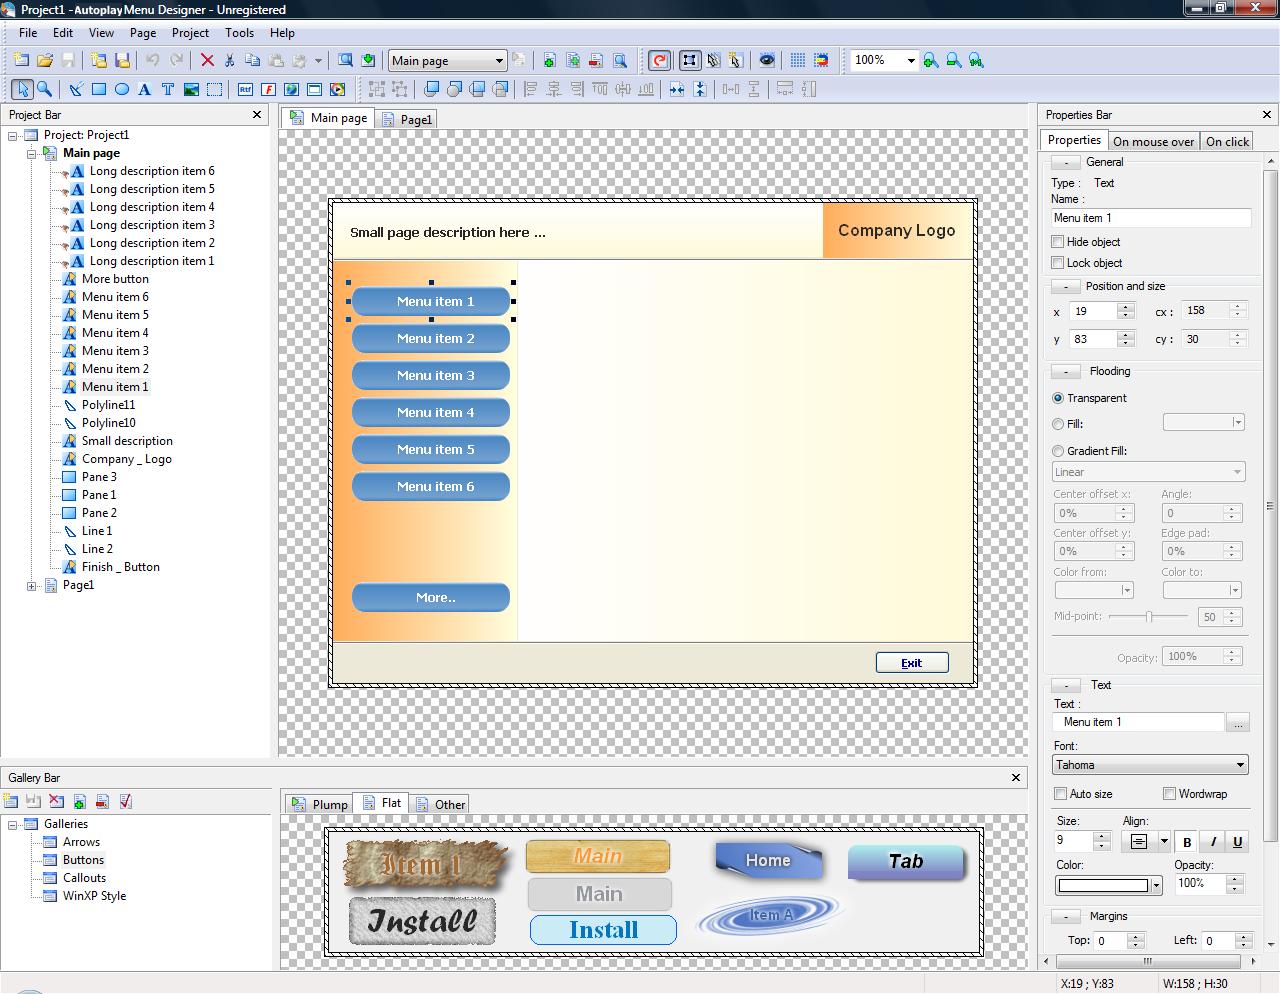 Autoplay+menu+designer